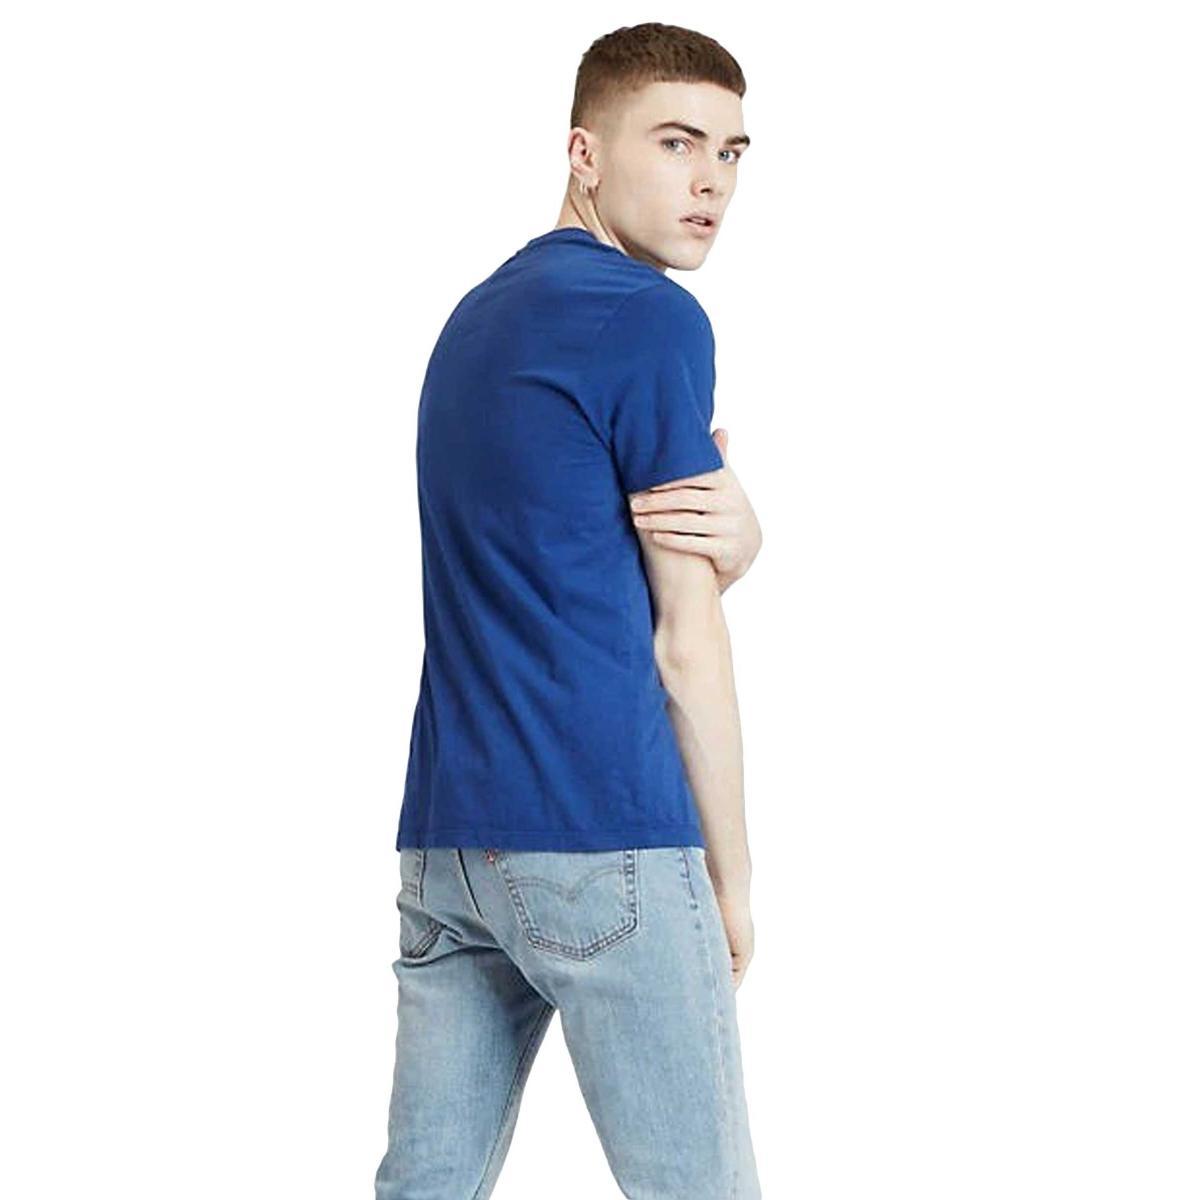 T-shirt Levi's Original Housemark Tee da uomo rif. 56605-0024